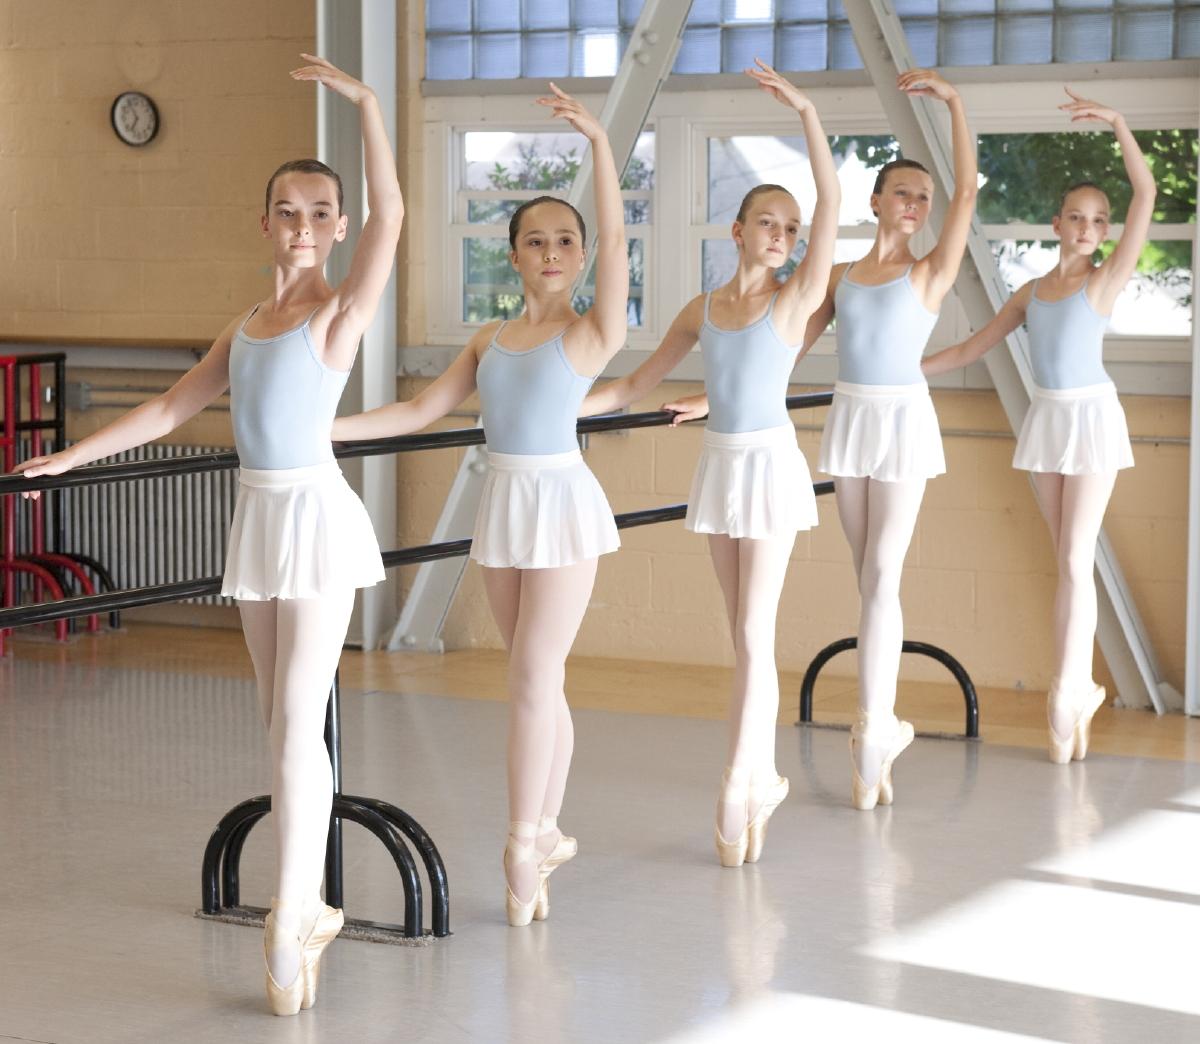 teach how to do juju on that beat dance